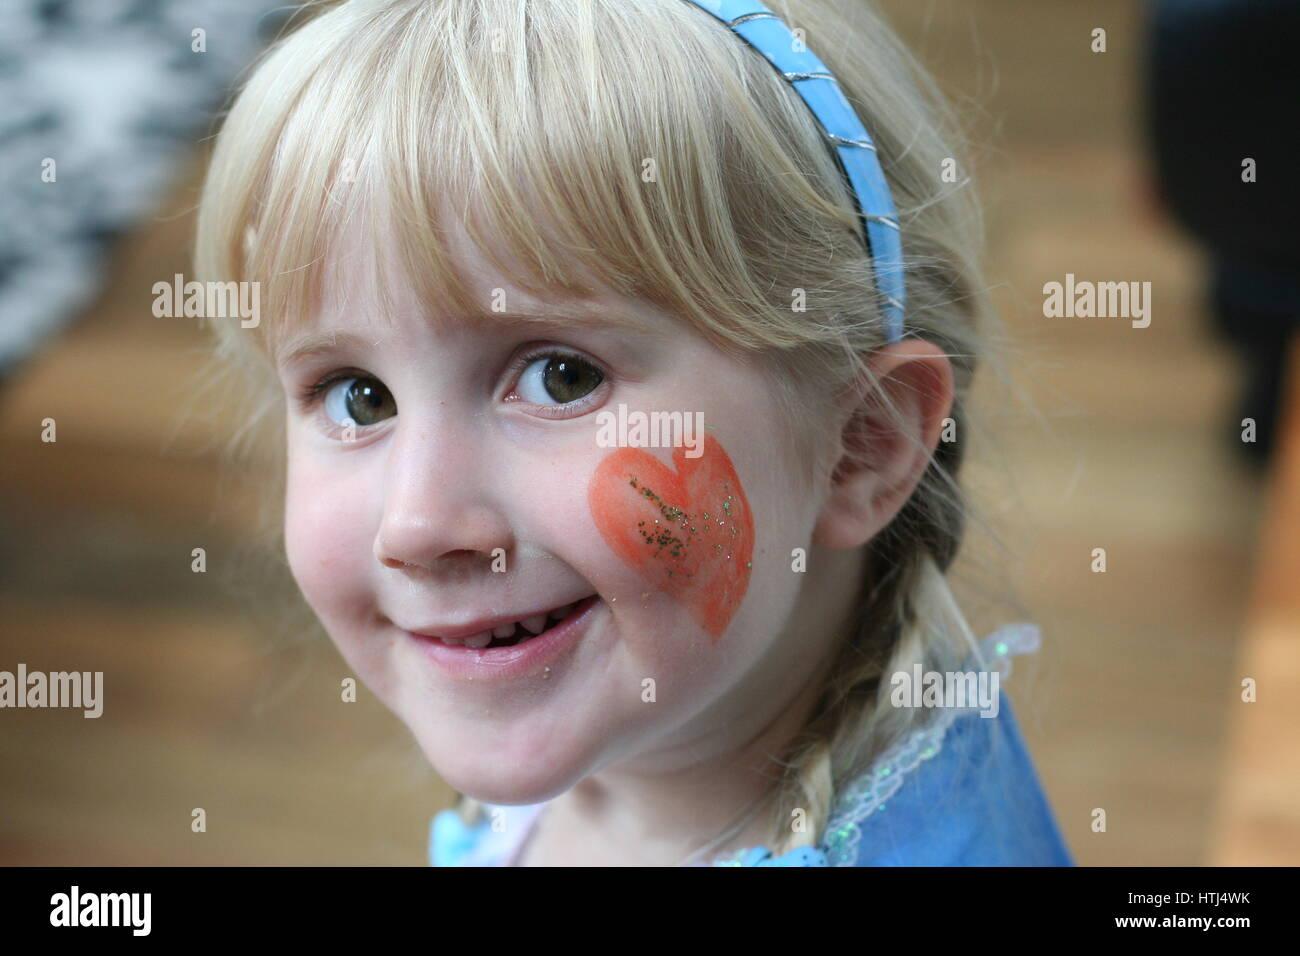 Little blonde girl dressed up as Disney Cinderella, facepaint, innocent concept, childhood concept - Stock Image